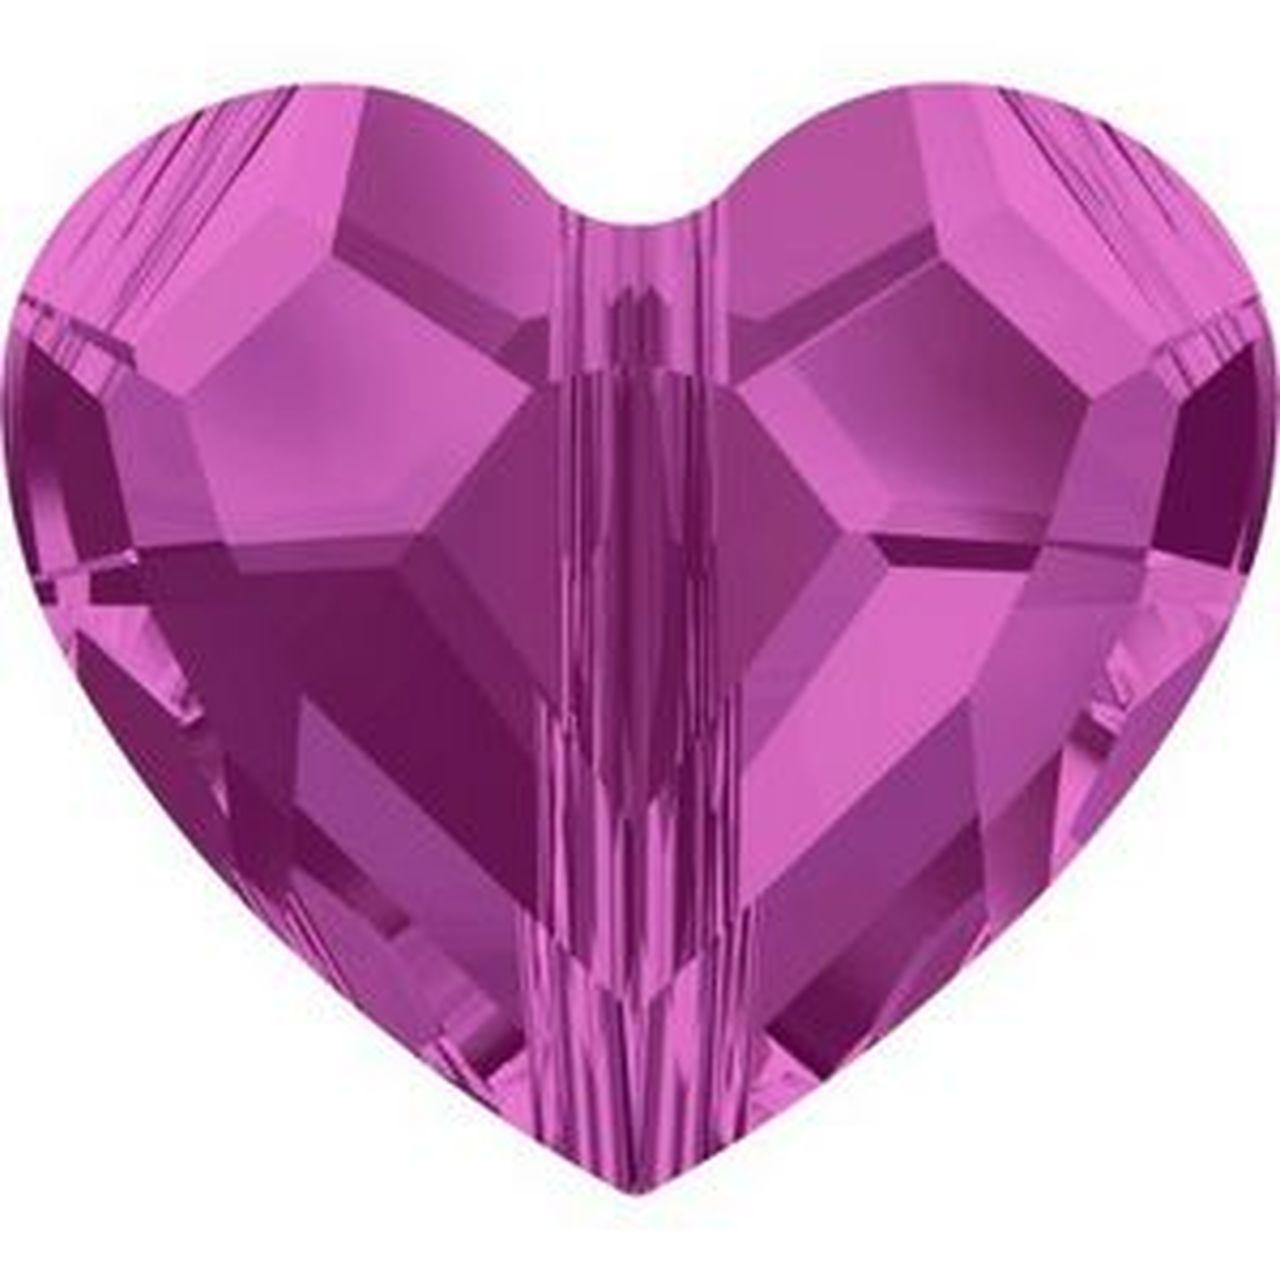 swarovski-heart-beads.jpg